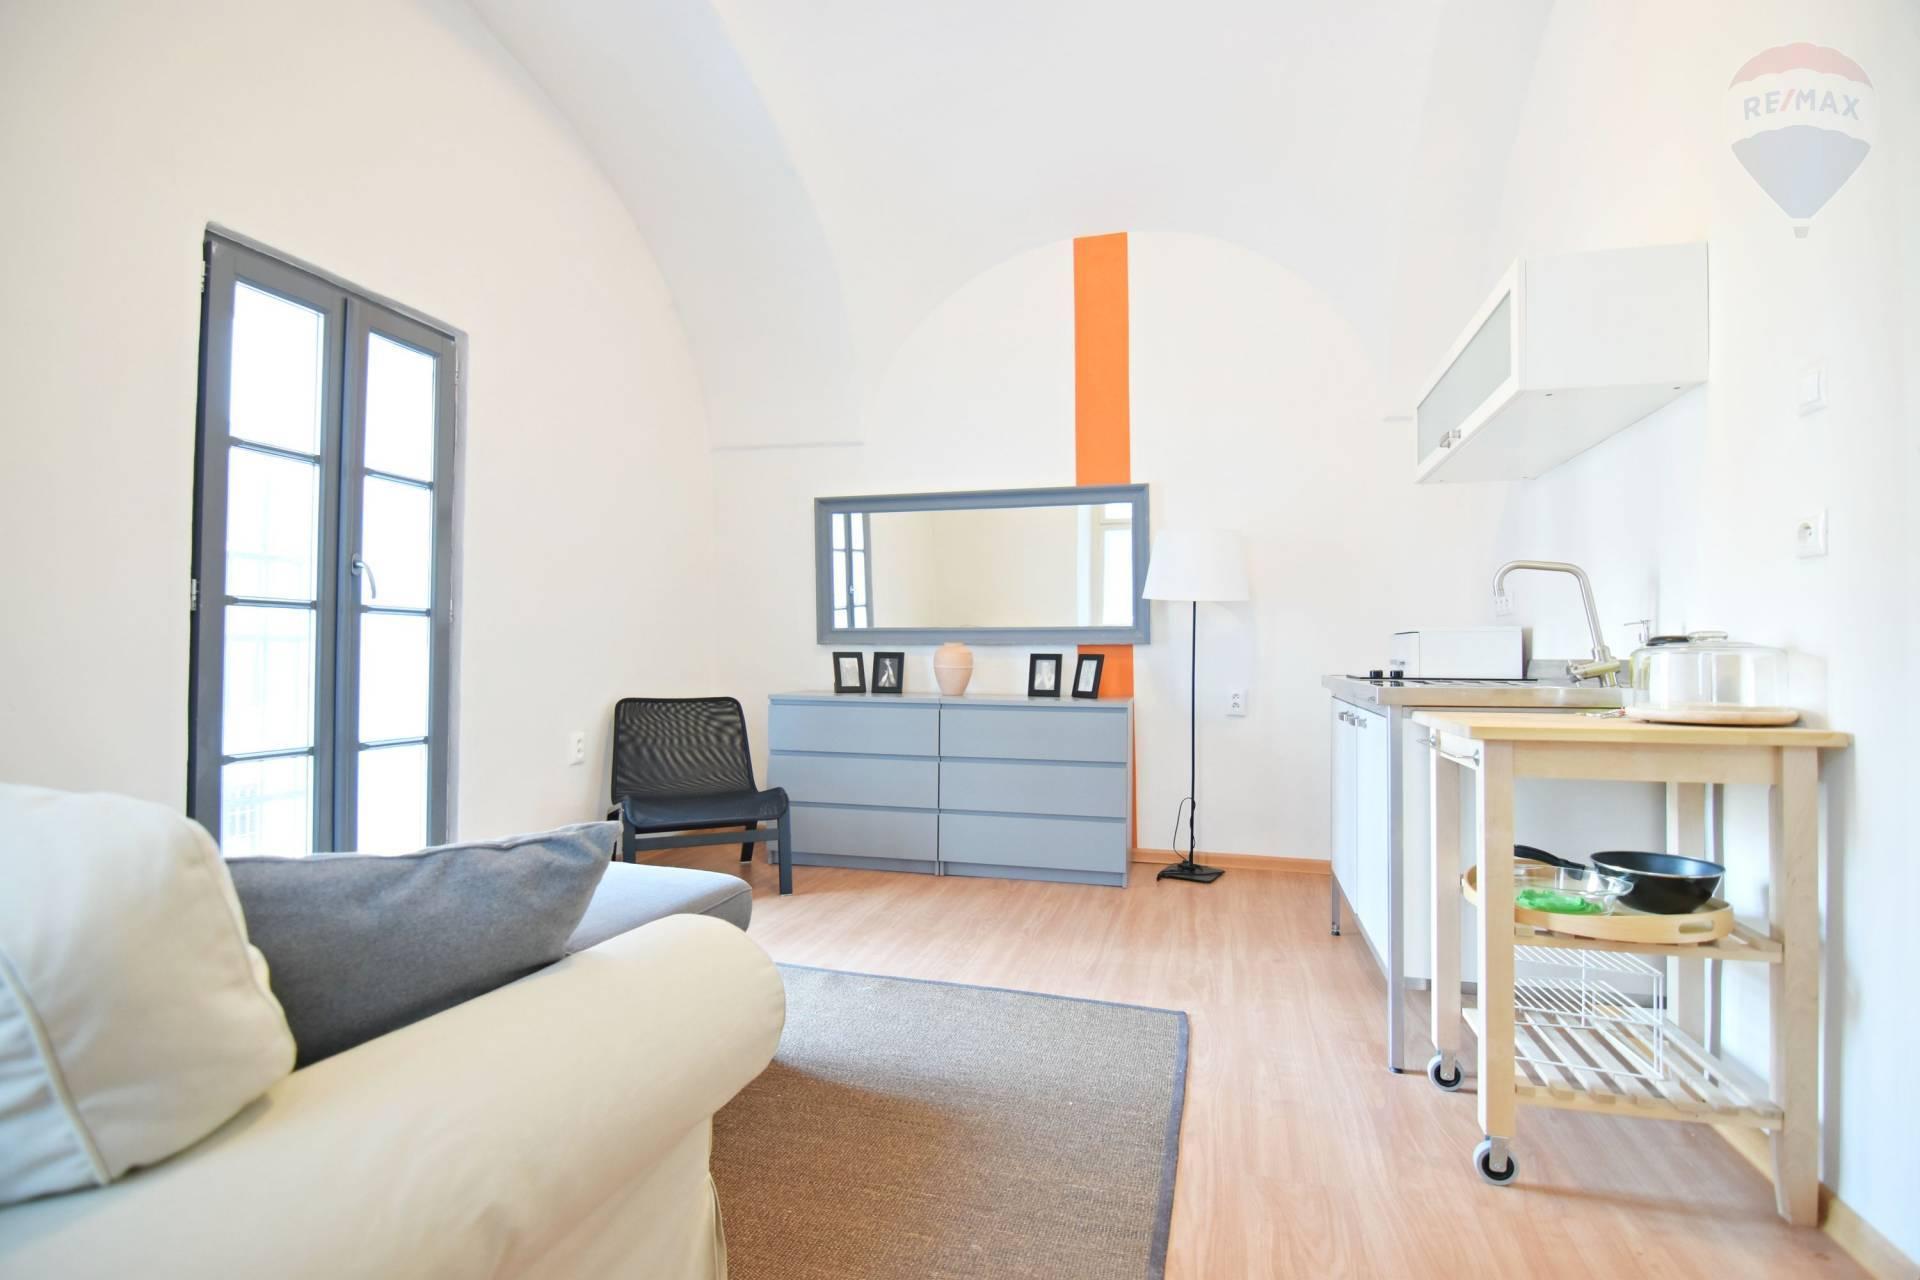 2 izb. Apartmán, 40 m2, ul. Hlavná